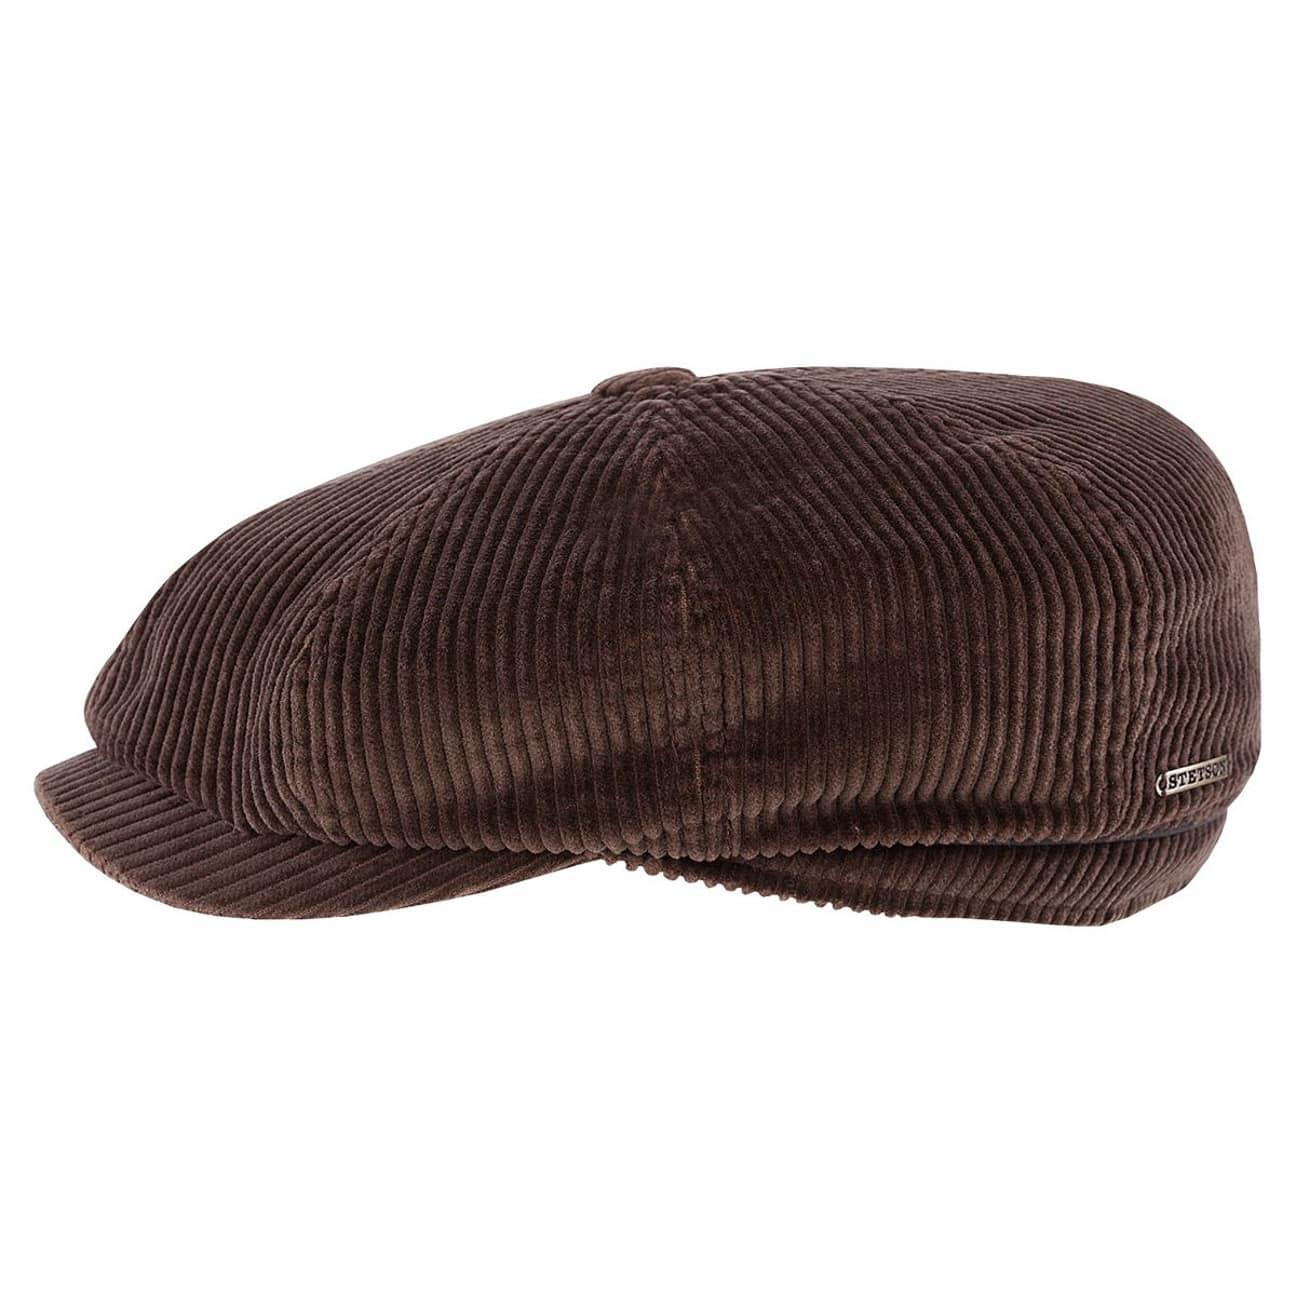 Gorra de Pana Hatteras by Stetson - Gorros - sombreroshop.es 48736471d0c